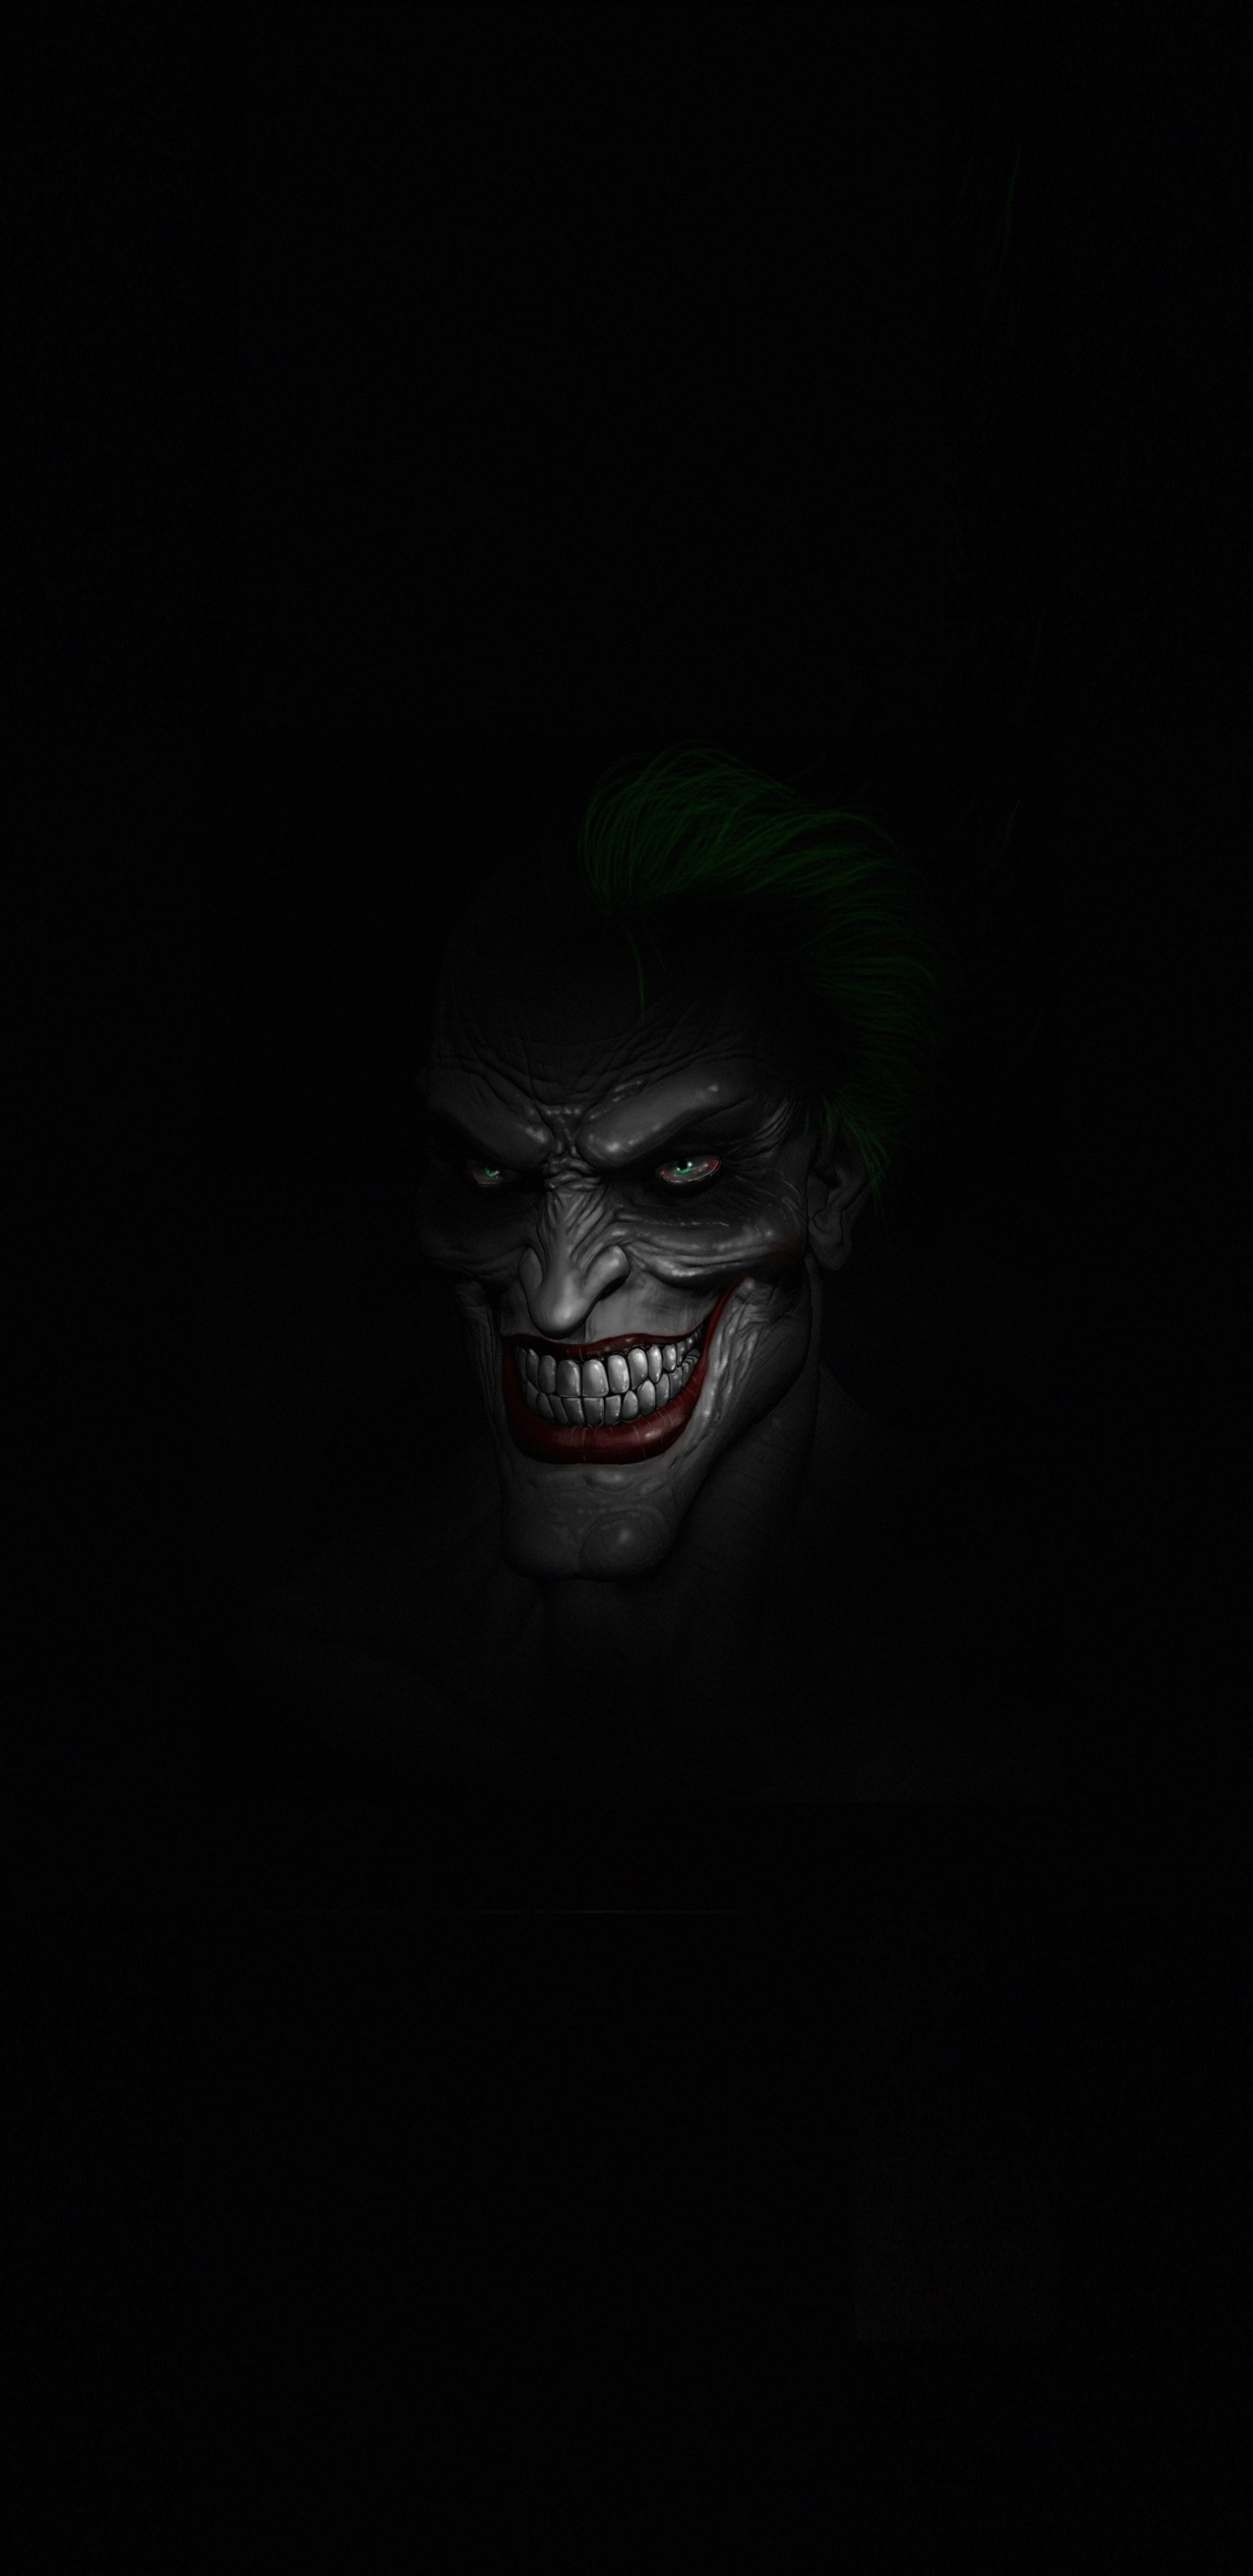 Download 1440x2960 Wallpaper Joker S Face Dark Minimal Samsung Galaxy S8 Samsung Galaxy S8 Plus 1440x2960 Hd Image Background 20167